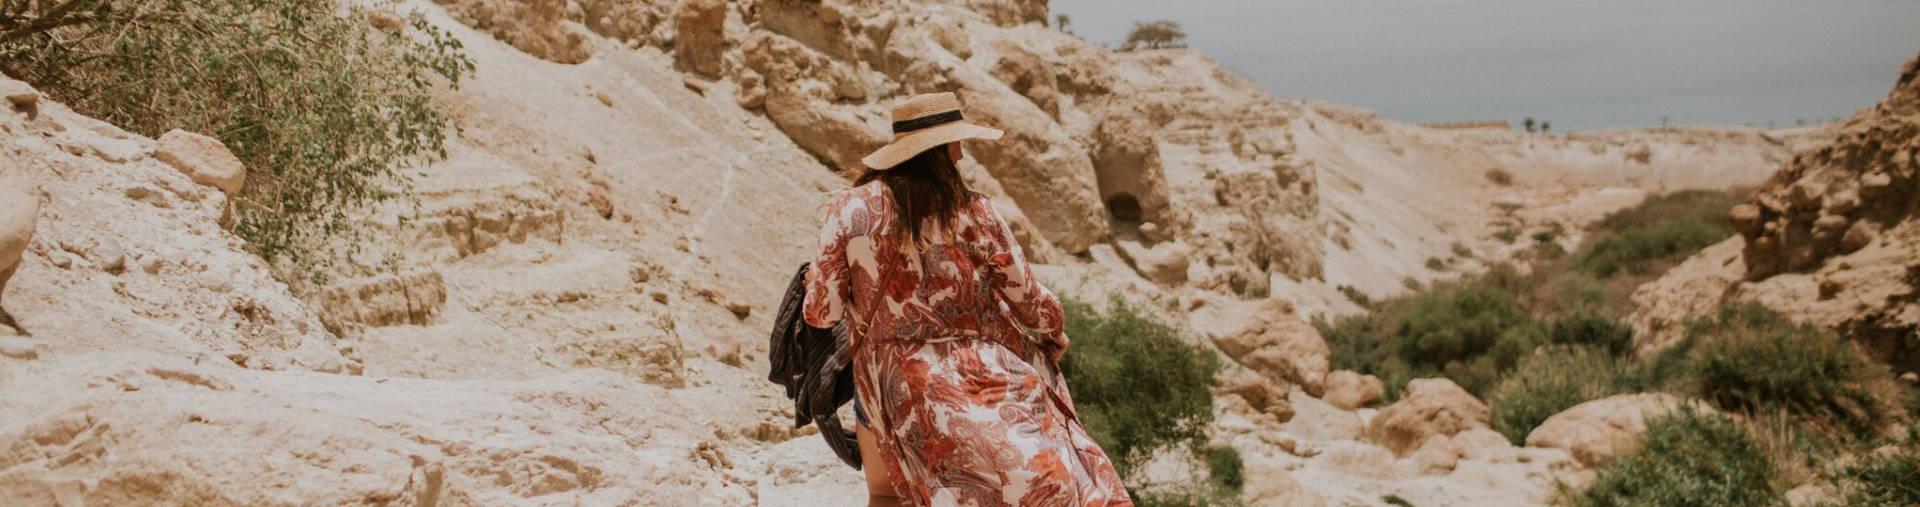 Masada, Ein Gedi & Dead Sea Tour from Jerusaelm